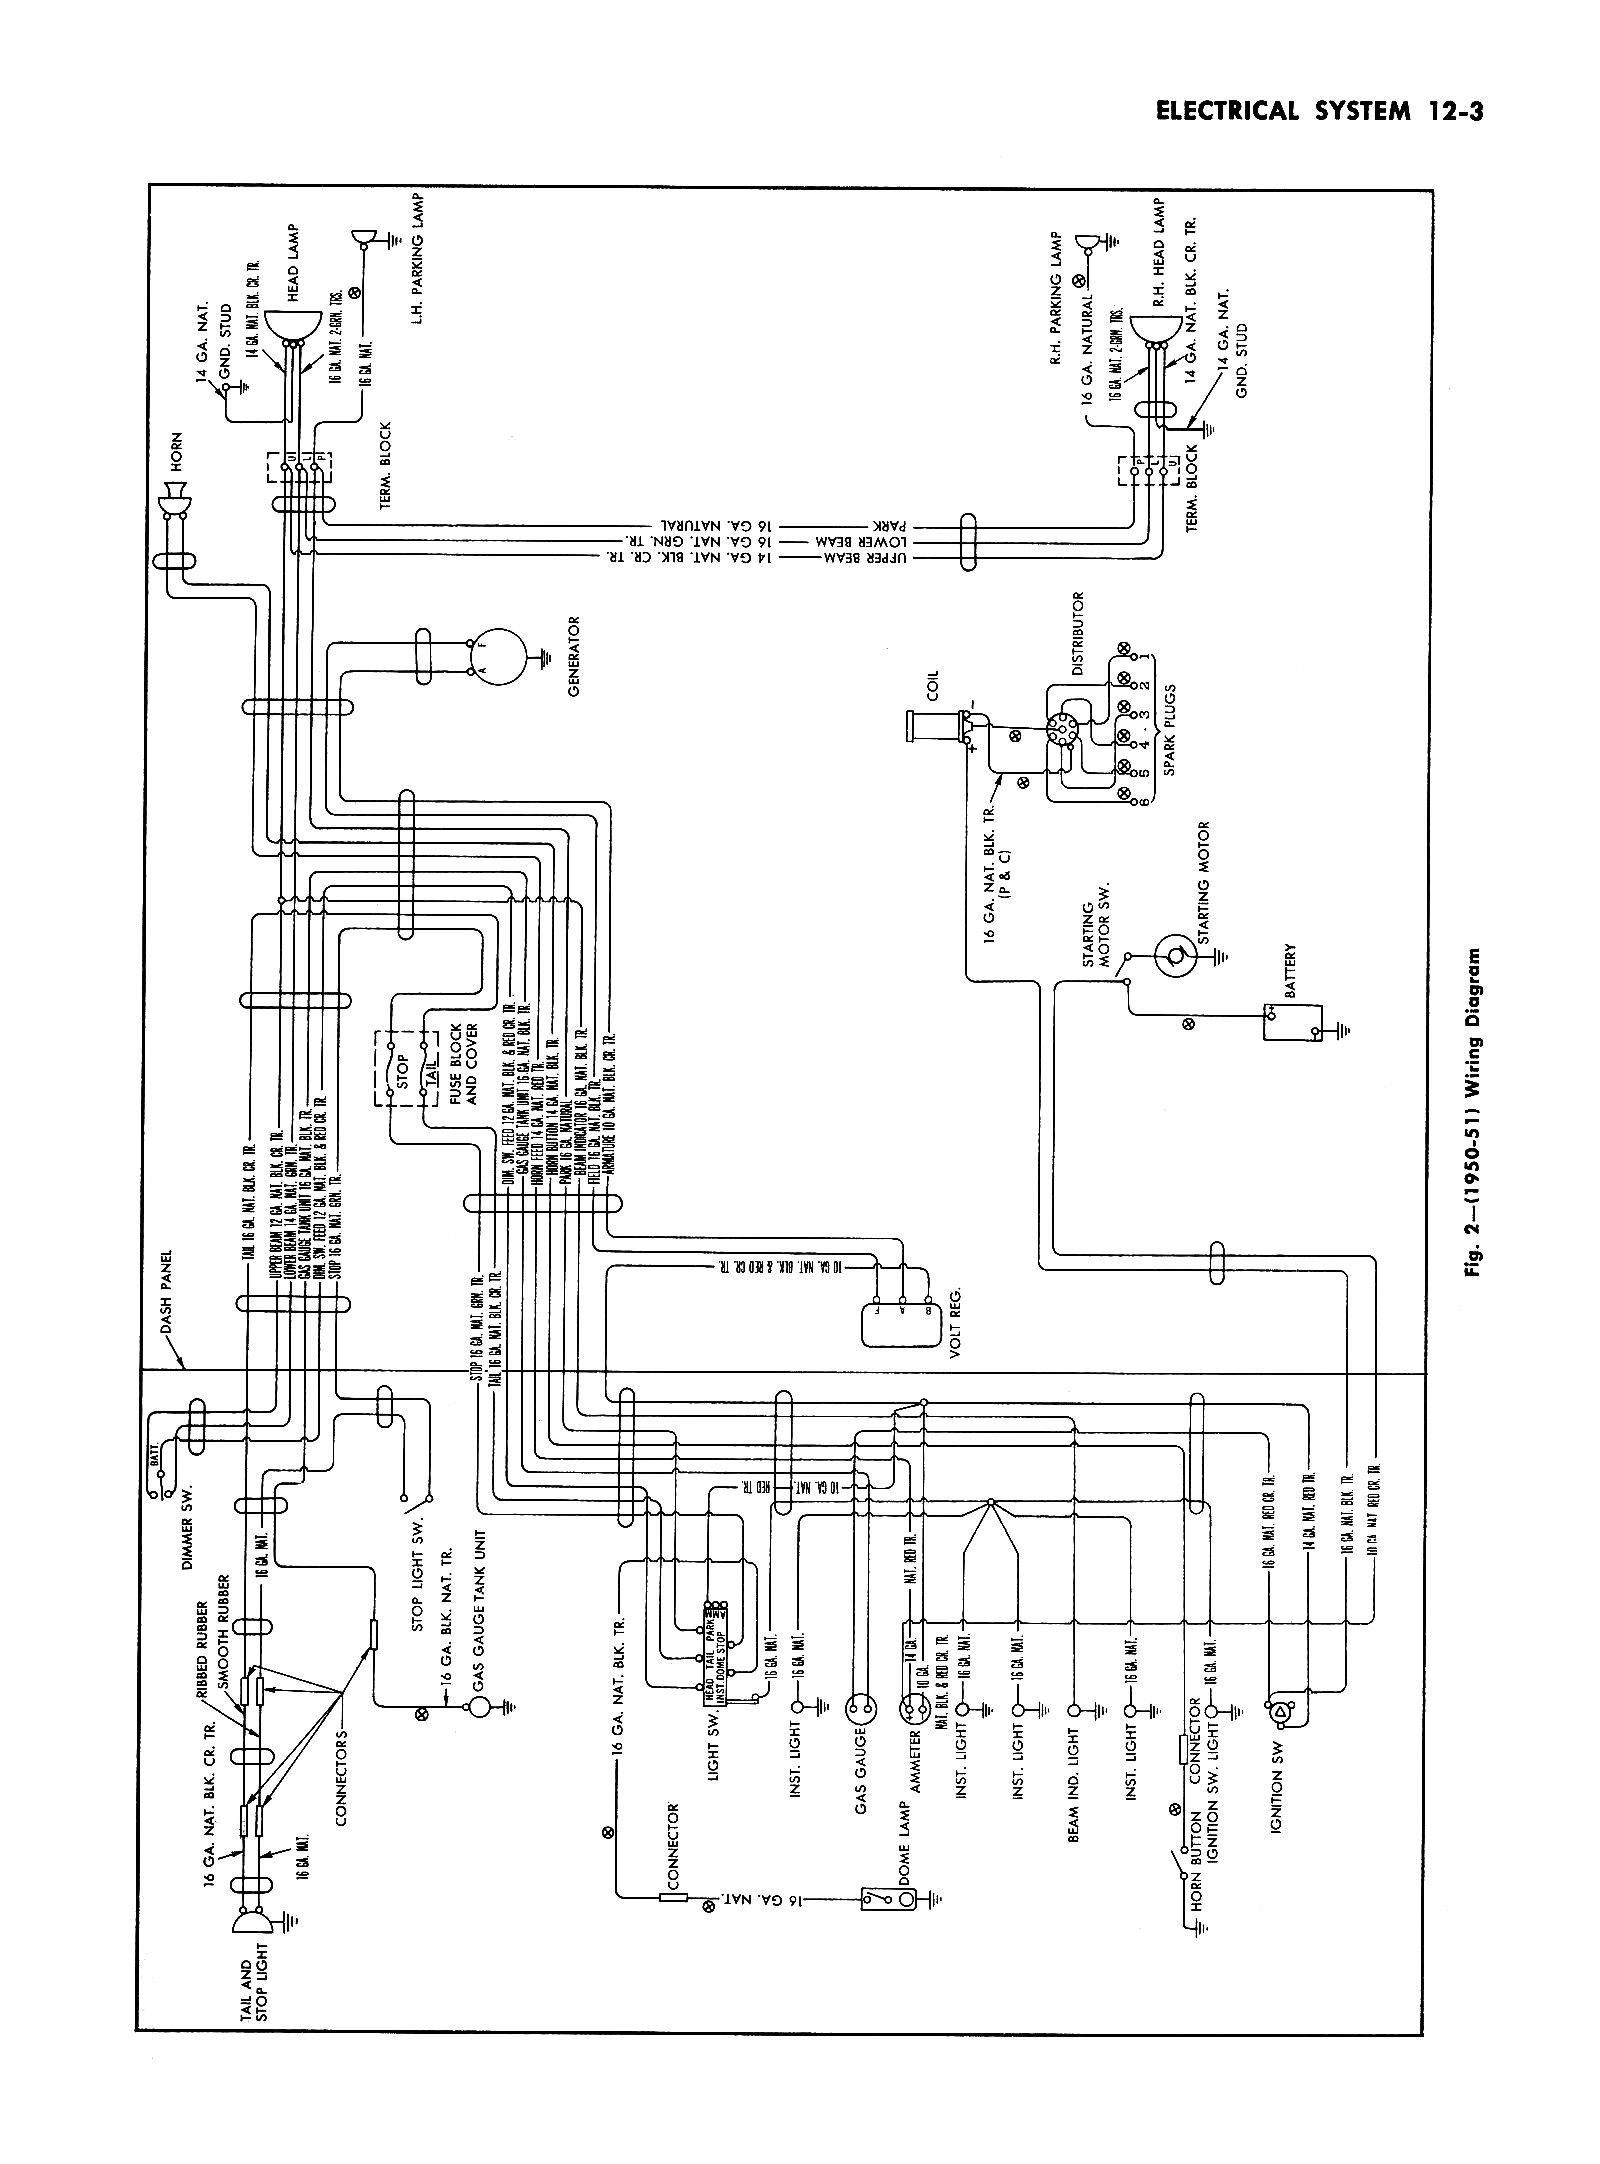 1951 Chevy Truck Wiring Diagram Chevy Trucks 1966 Chevy Truck 1951 Chevy Truck